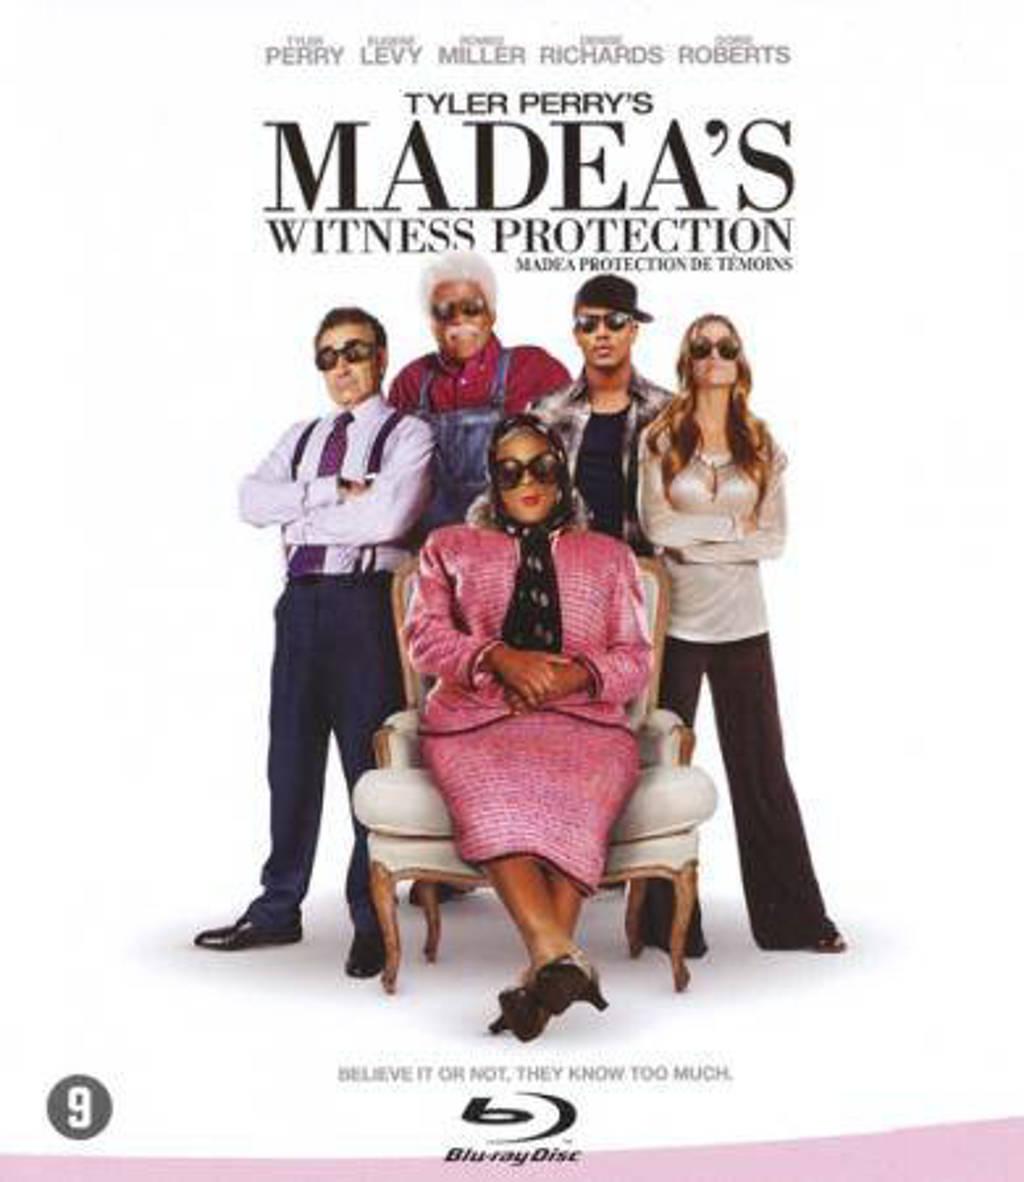 Madea's witness protection (Blu-ray)